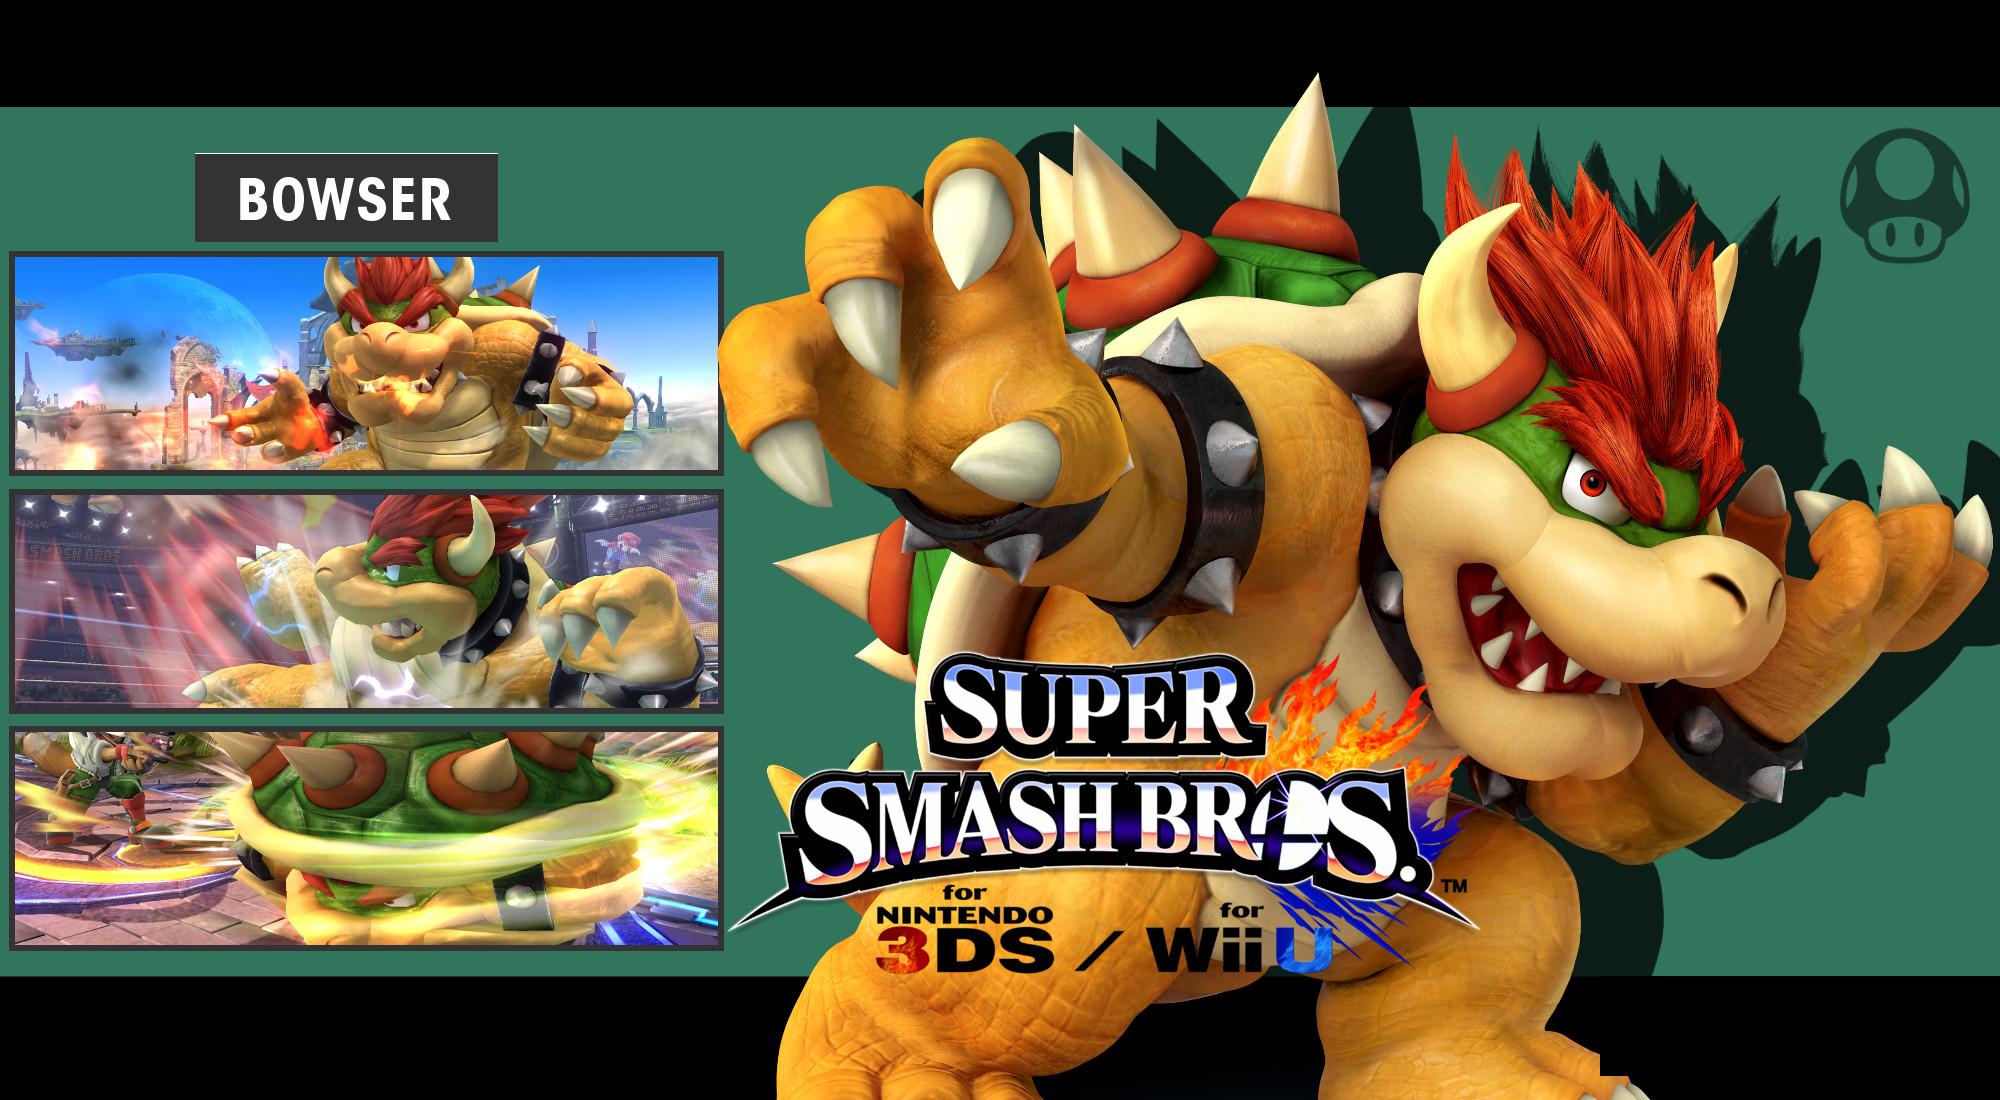 … DaKidGaming Super Smash Bros. 3DS/Wii U – Bowser Wallpaper by  DaKidGaming